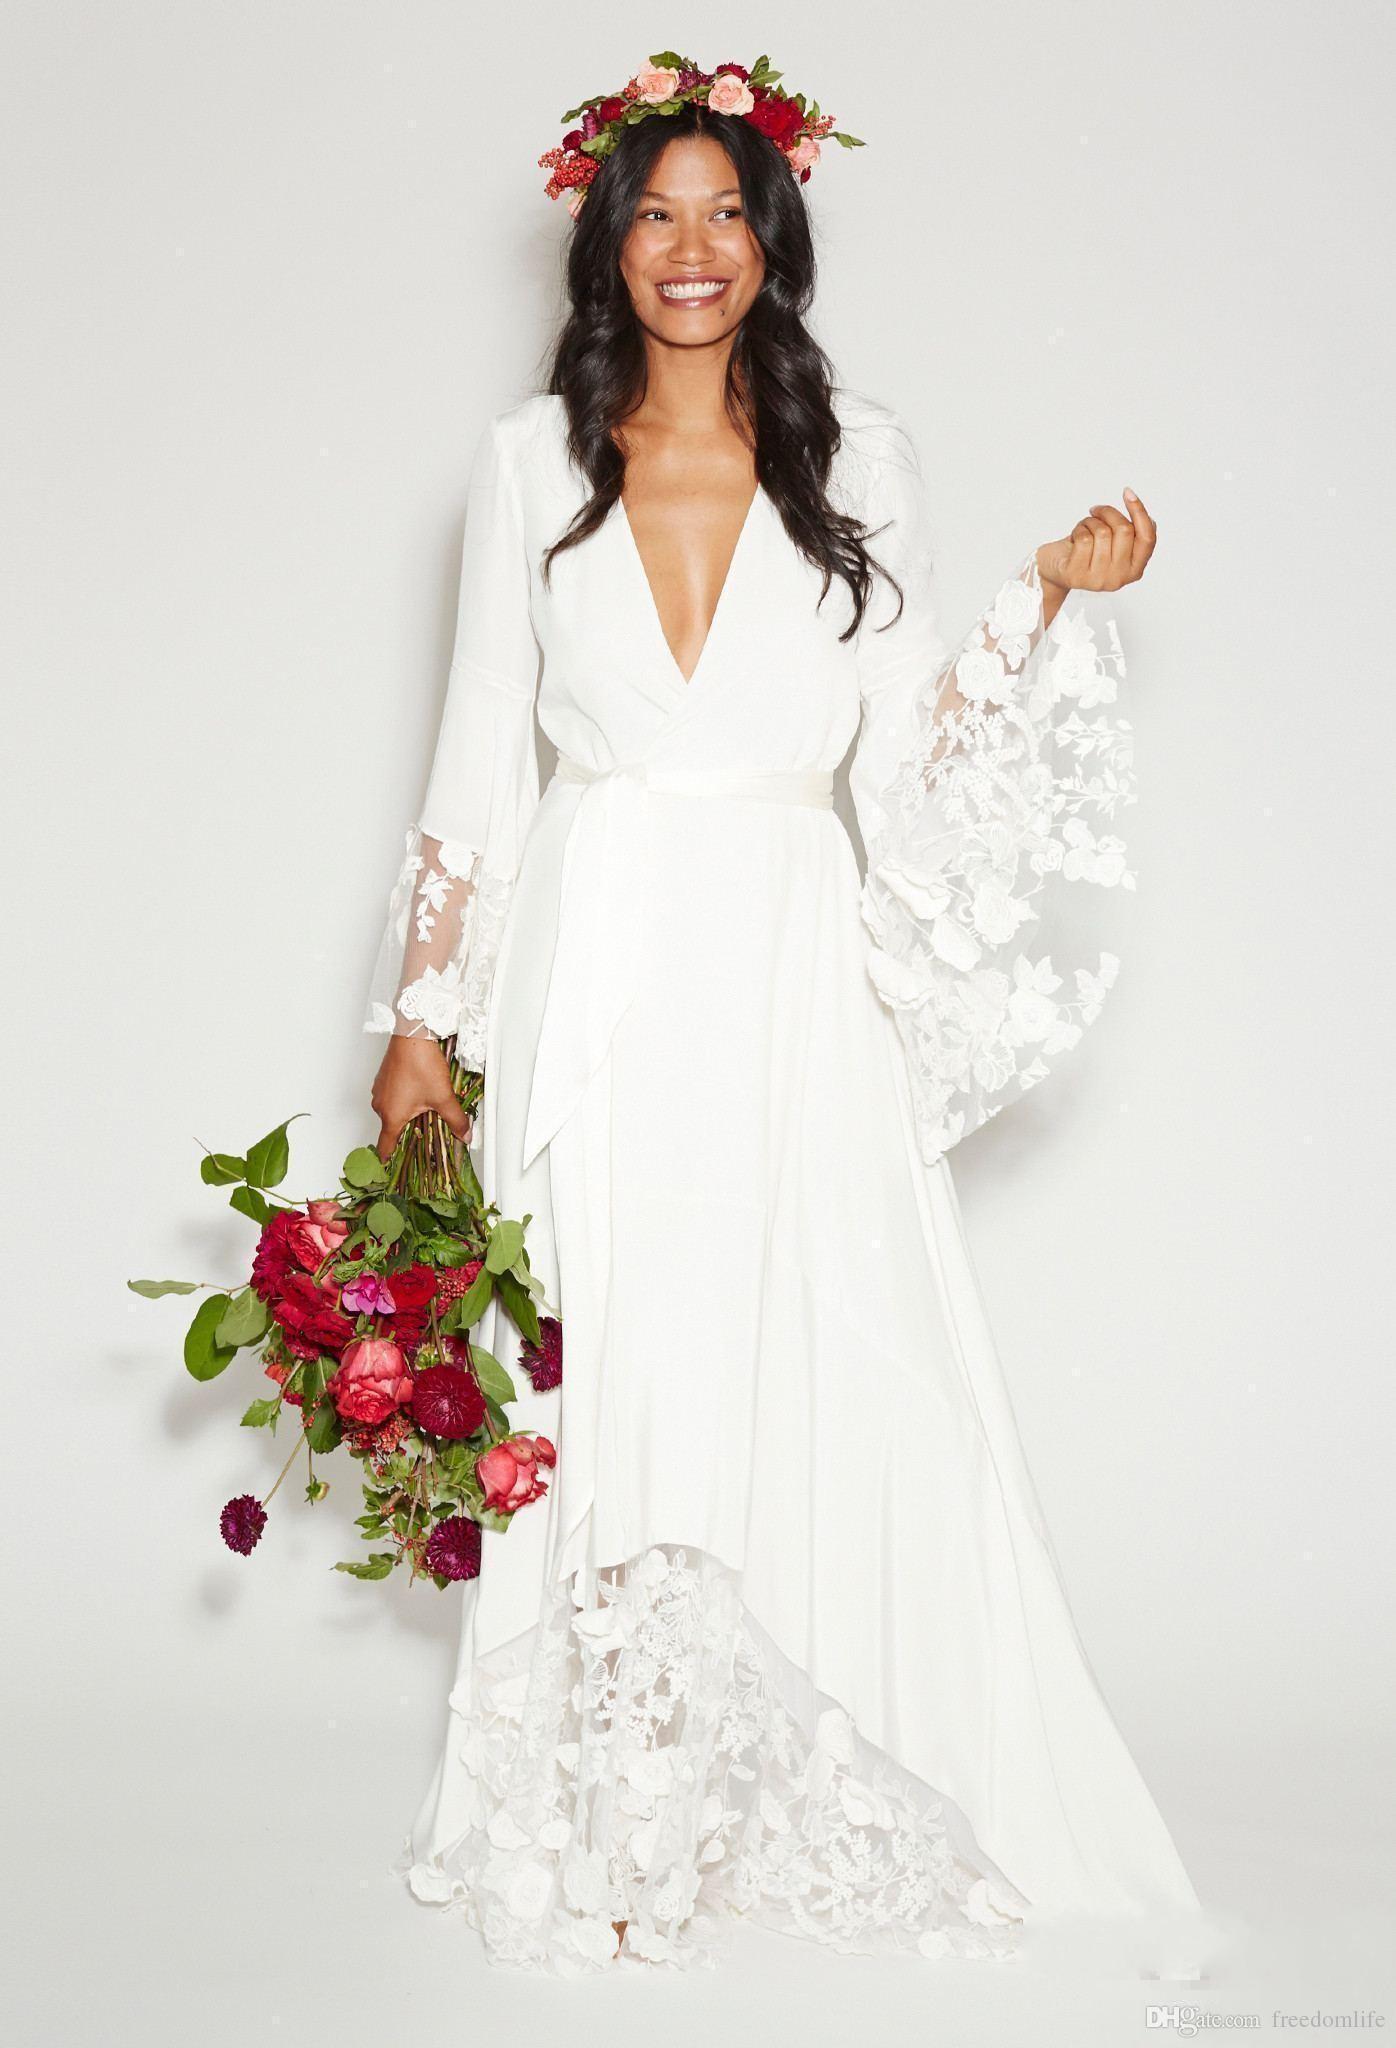 Hot Sale Boho Beach Wedding Dresses Long Bell Sleeve Lace Flower Bridal Gowns Plus Size Hippie Bohemian Wedding Dress Cheap vestido de novia